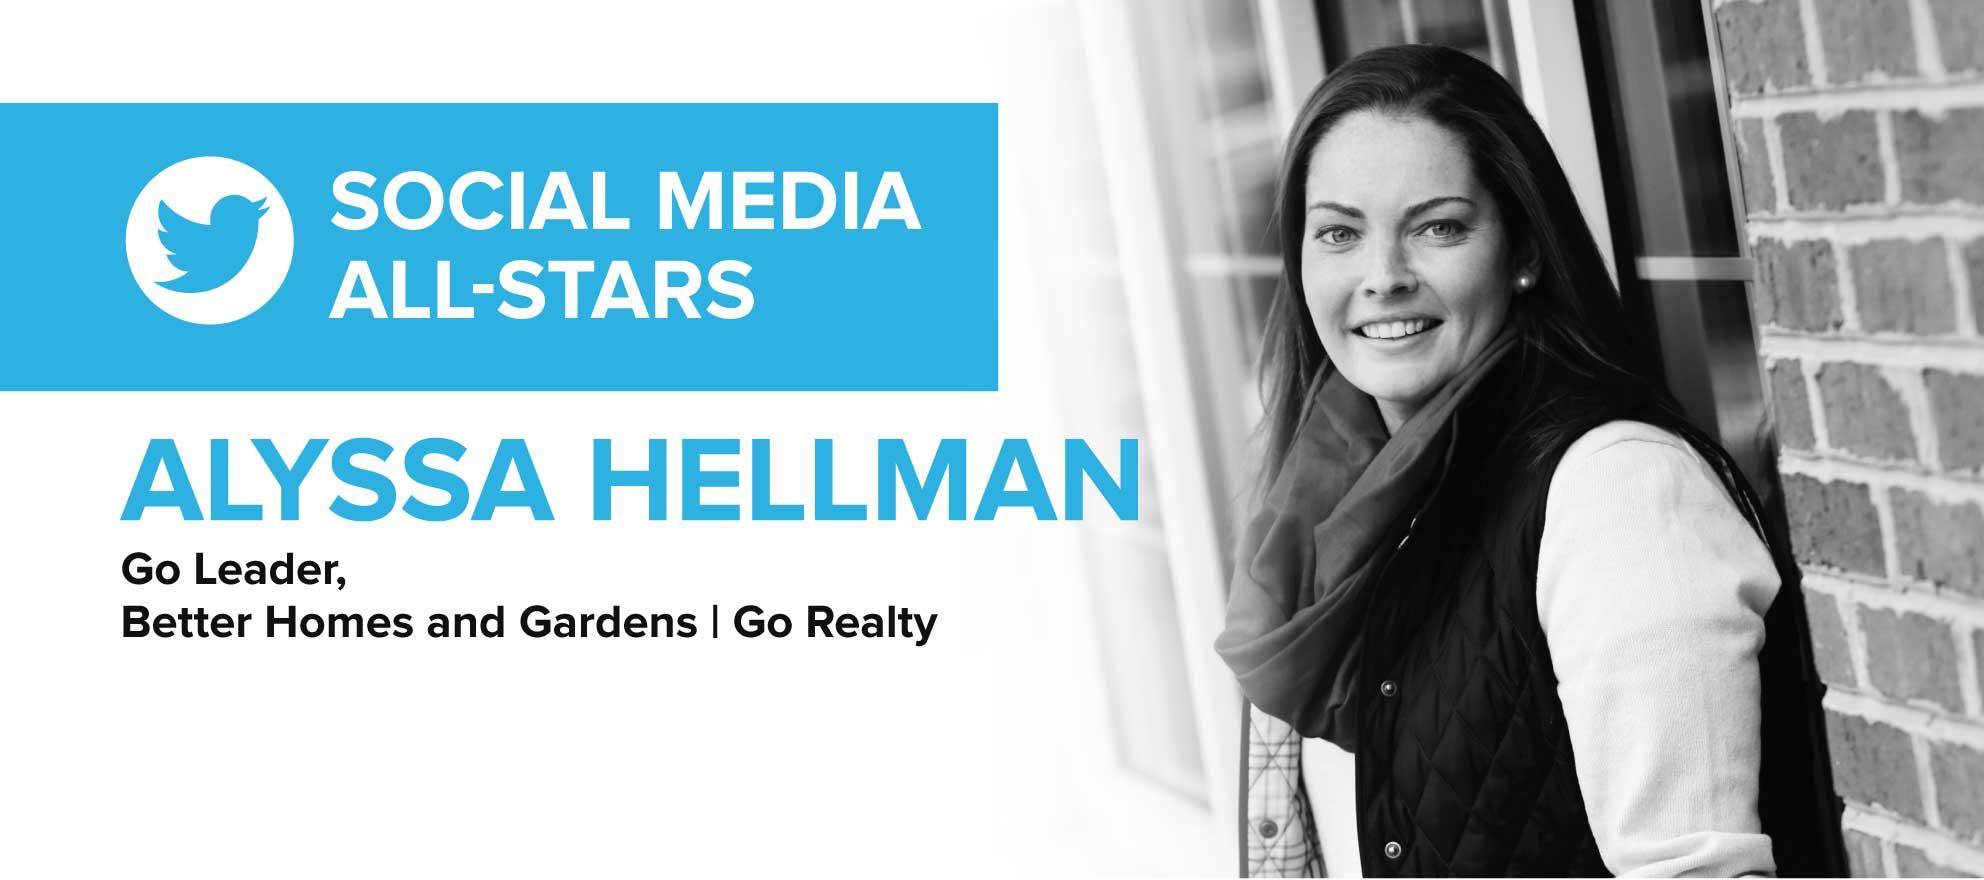 Alyssa Hellman: 'I never operate as a business on social media'